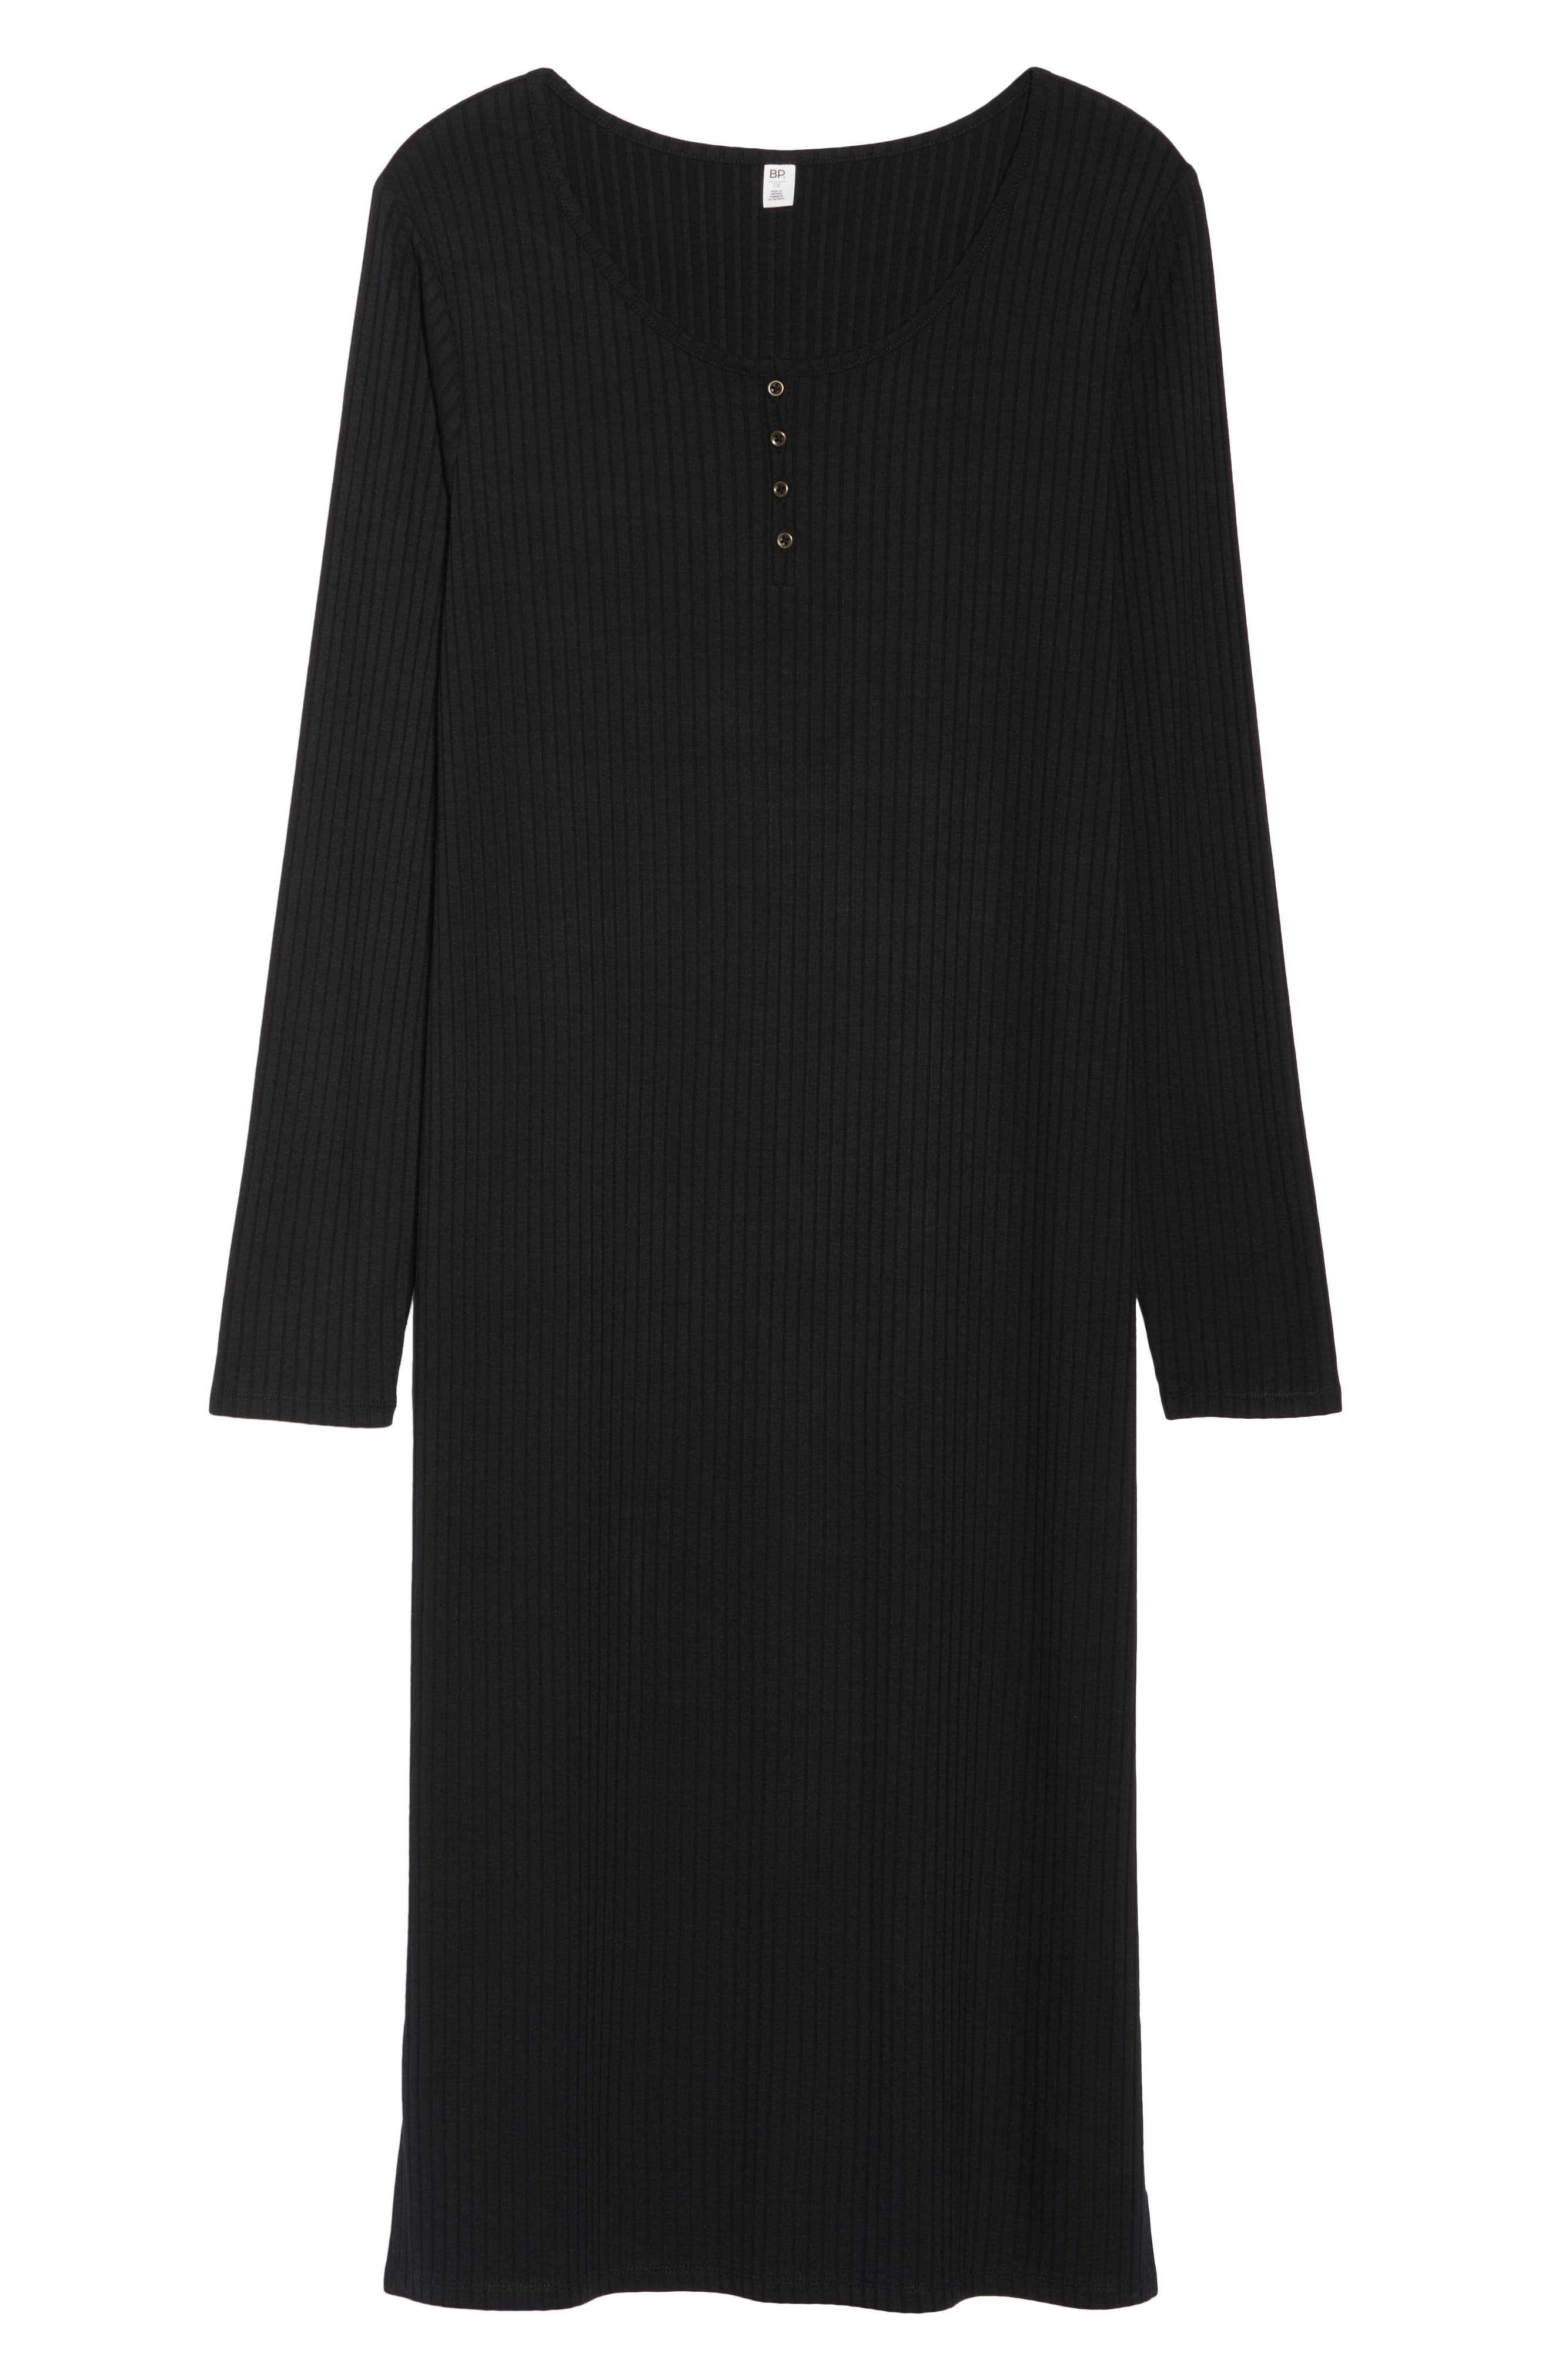 Ribbed Henley Midi Dress,                             Alternate thumbnail 12, color,                             001